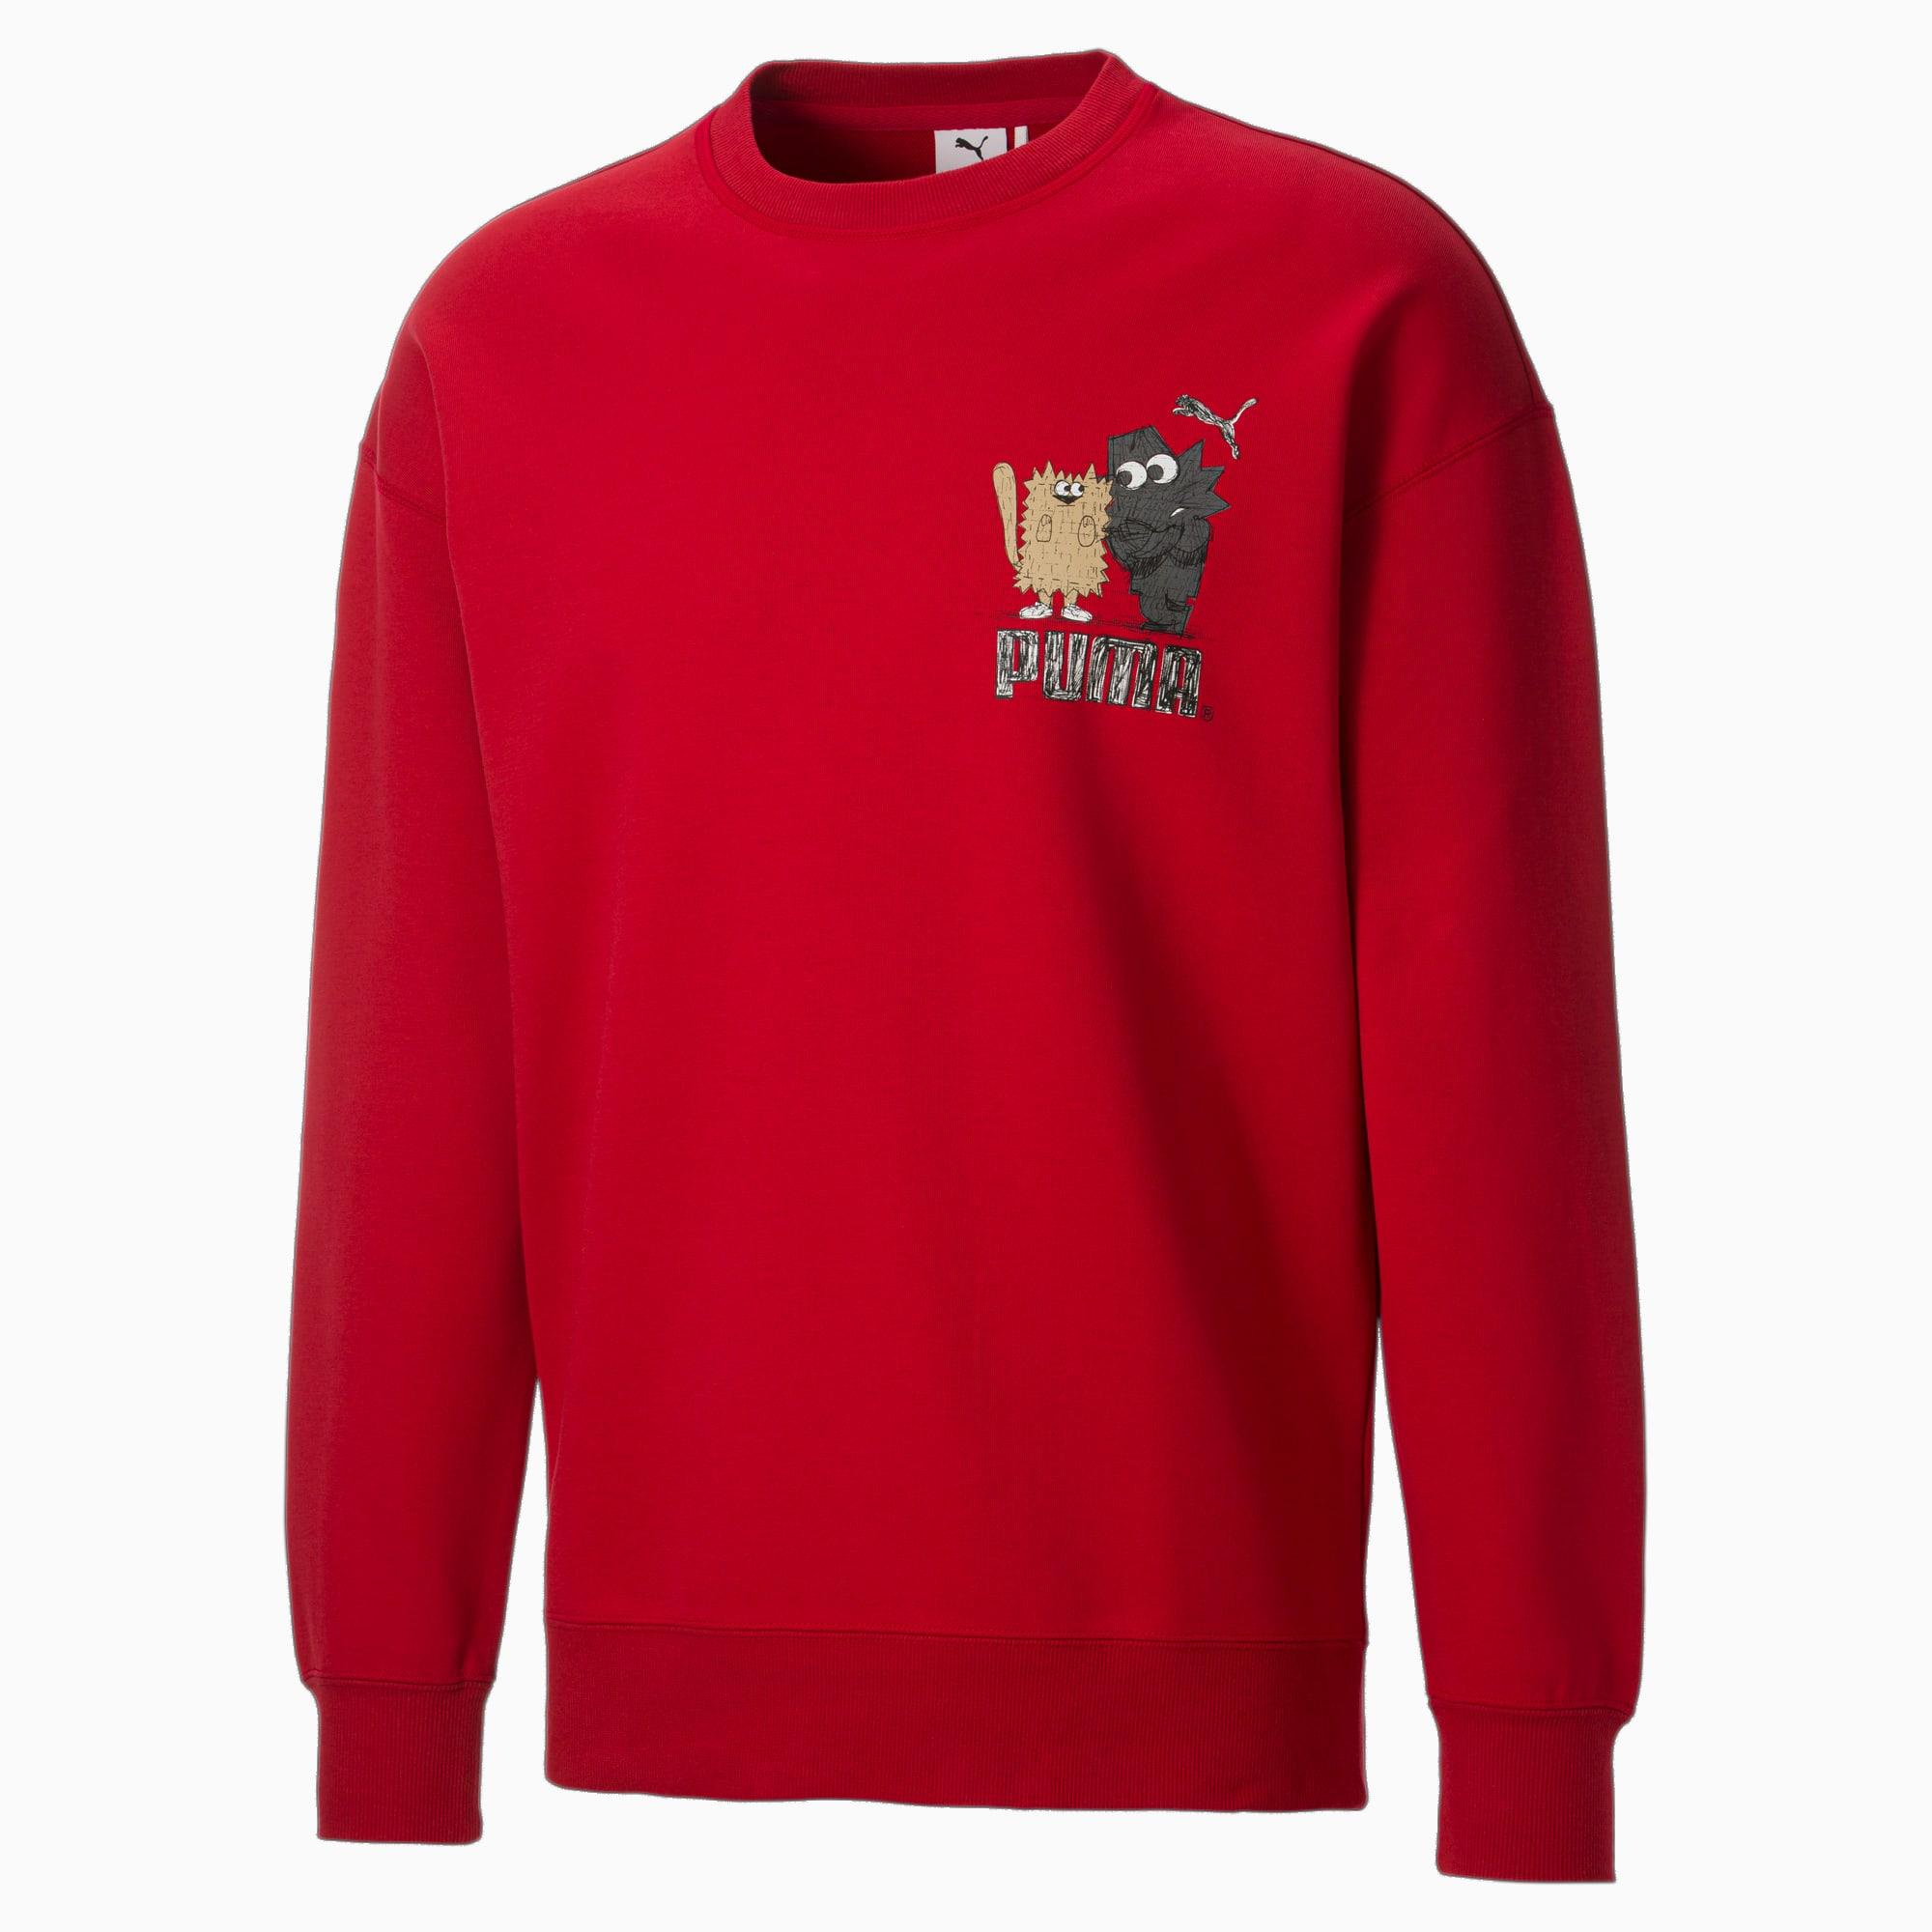 PUMA x MICHAEL LAU G herensweater met ronde hals, Maat XS